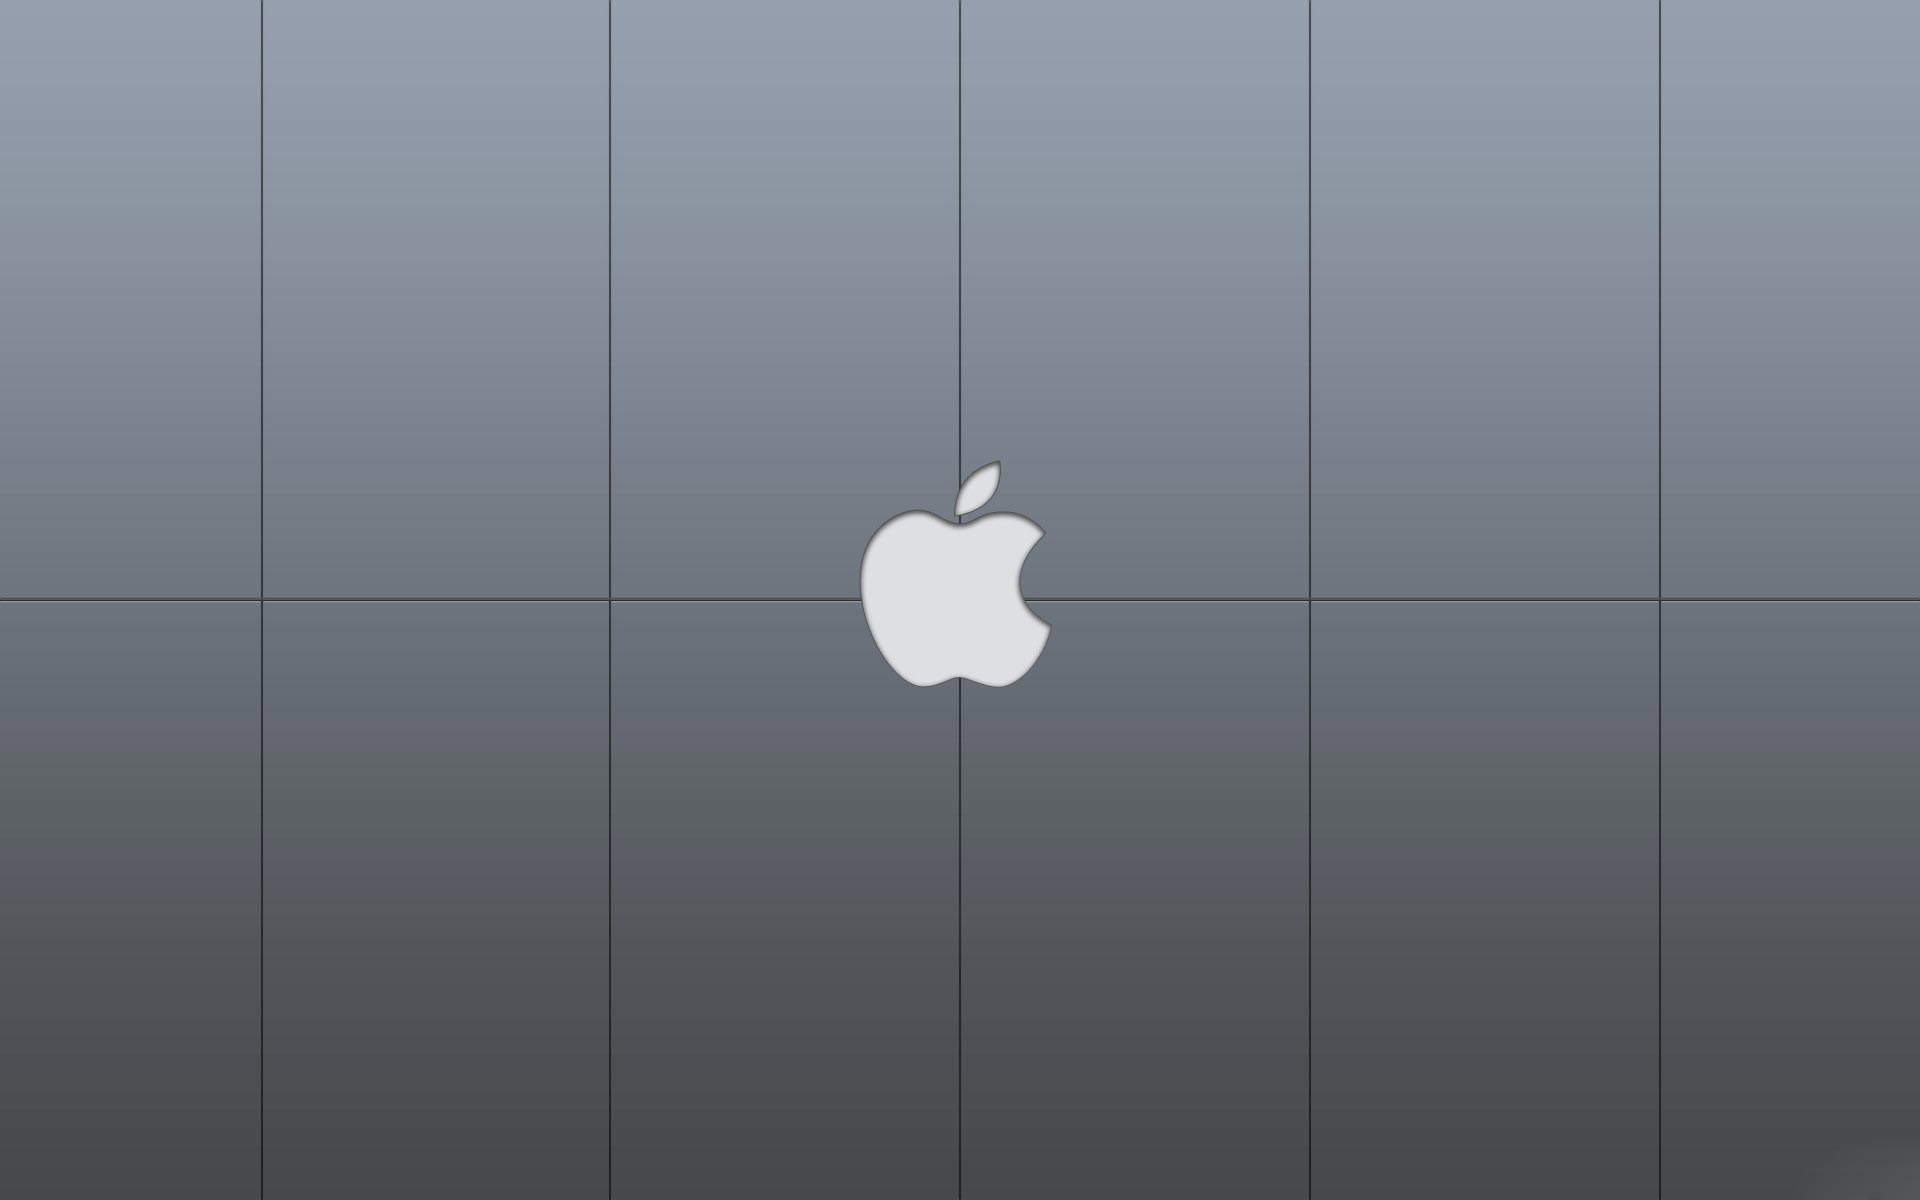 hd wallpapers for macbook pro retina